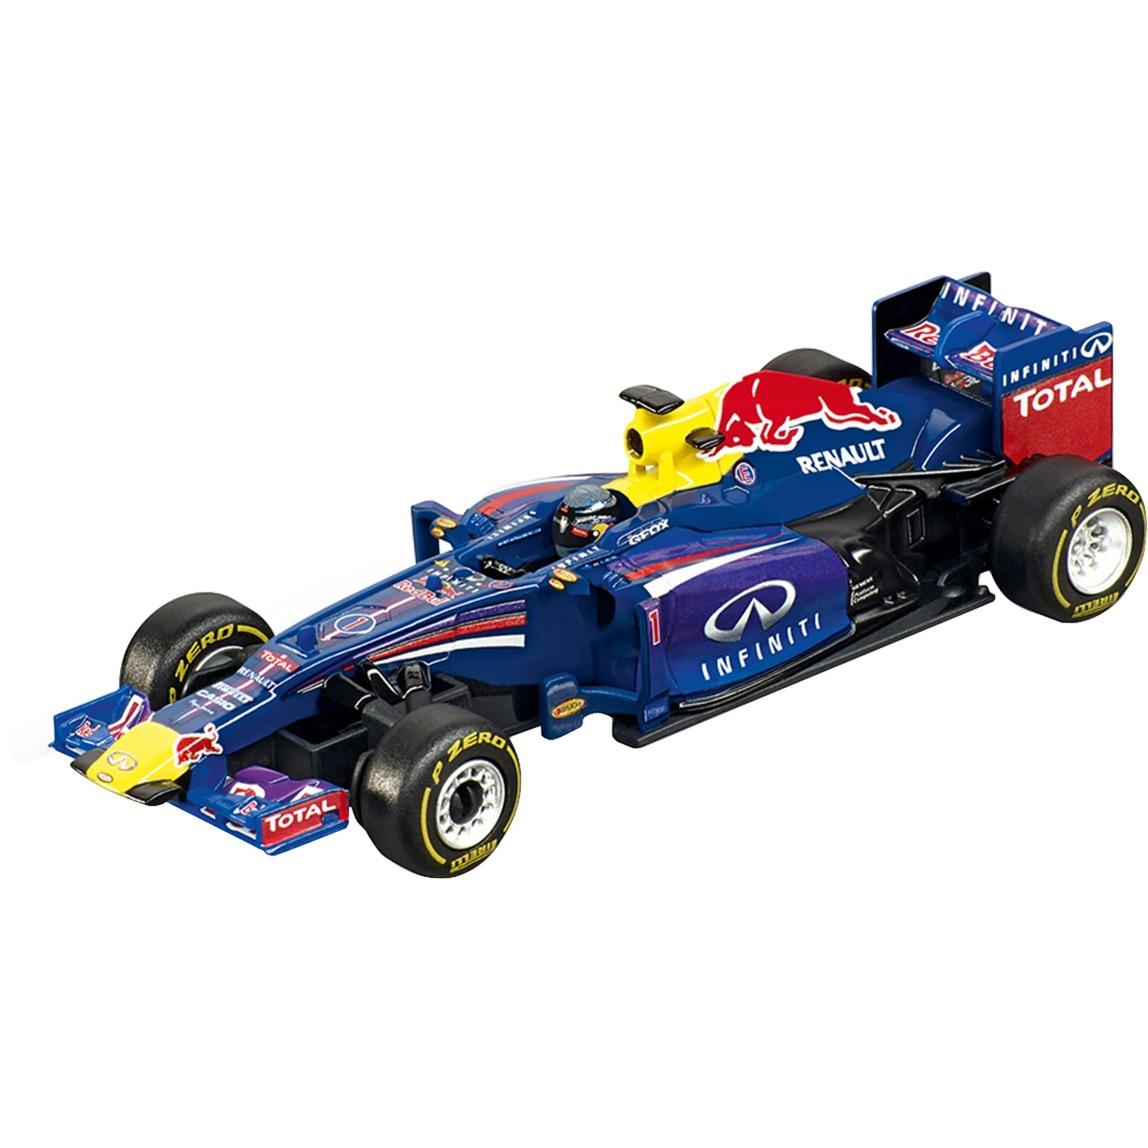 digital-143-infiniti-red-bull-racing-rb9-svettel-1-racerbil